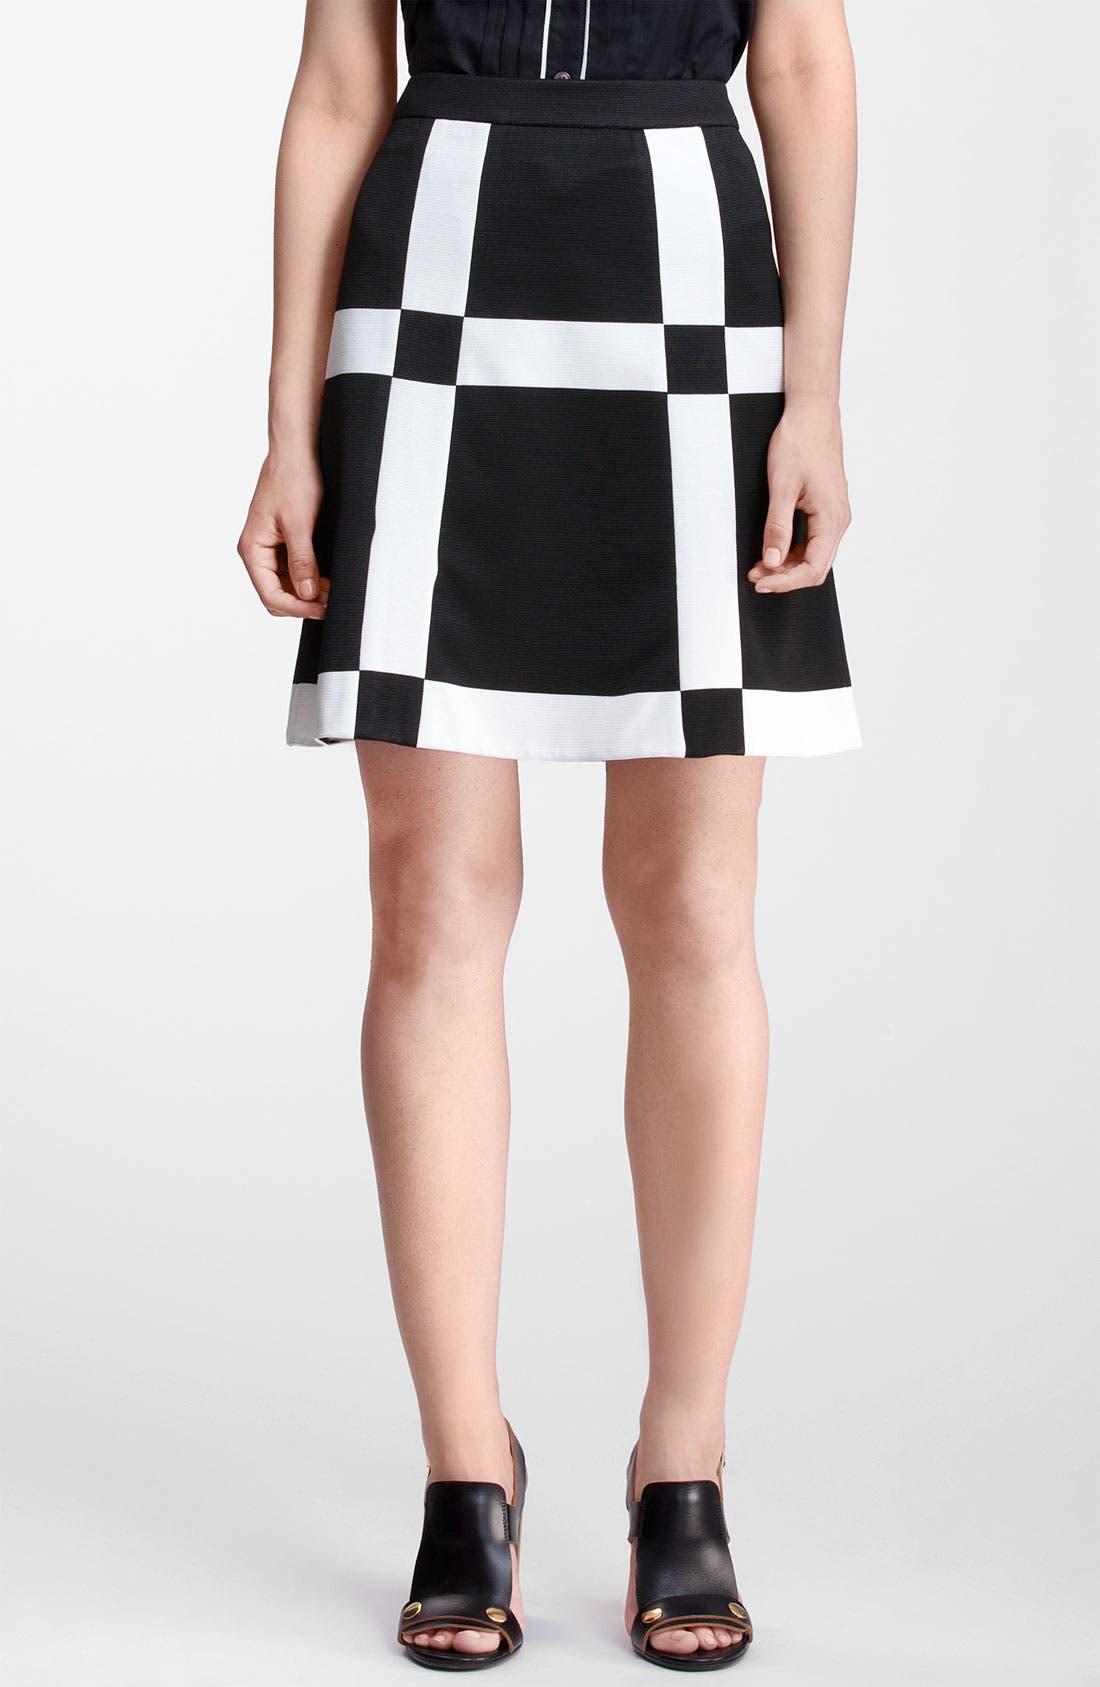 Alternate Image 1 Selected - Marni Edition Grid Print Knit Skirt